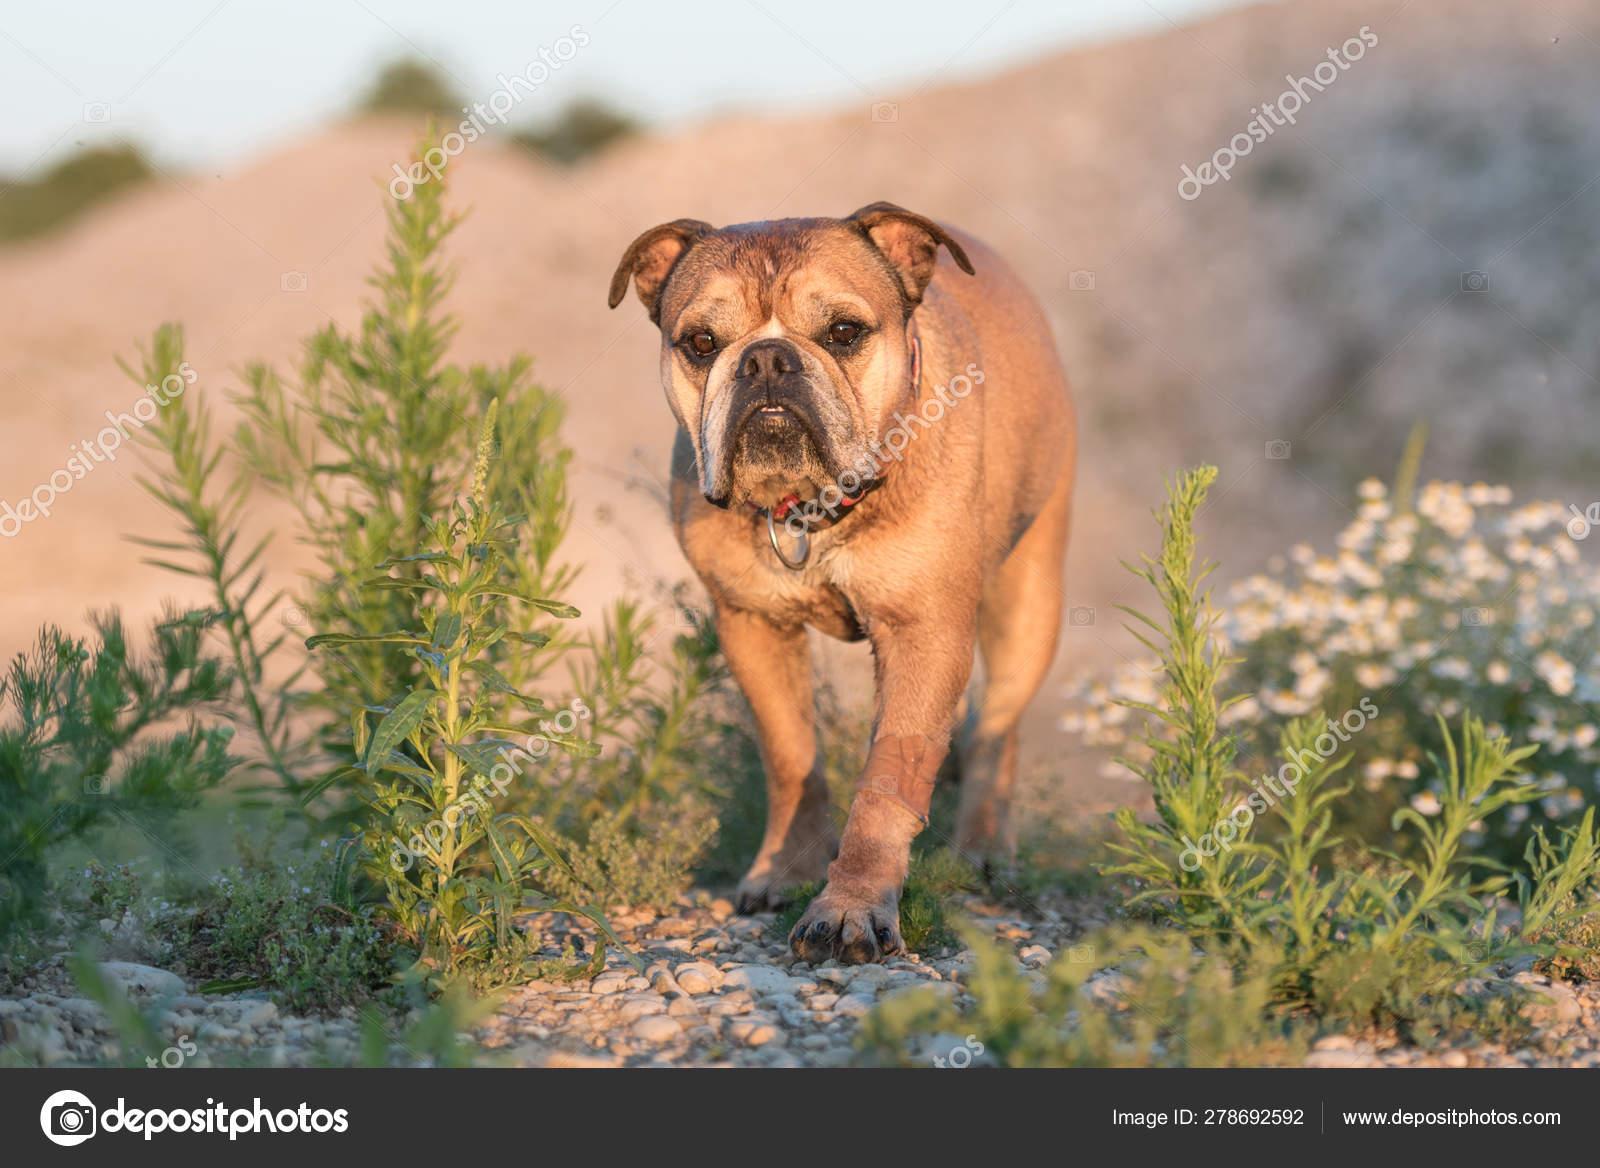 Cute Continental Bulldog Dog Is Standing In A Beautiful Meadow Stock Photo C Thaka11 278692592